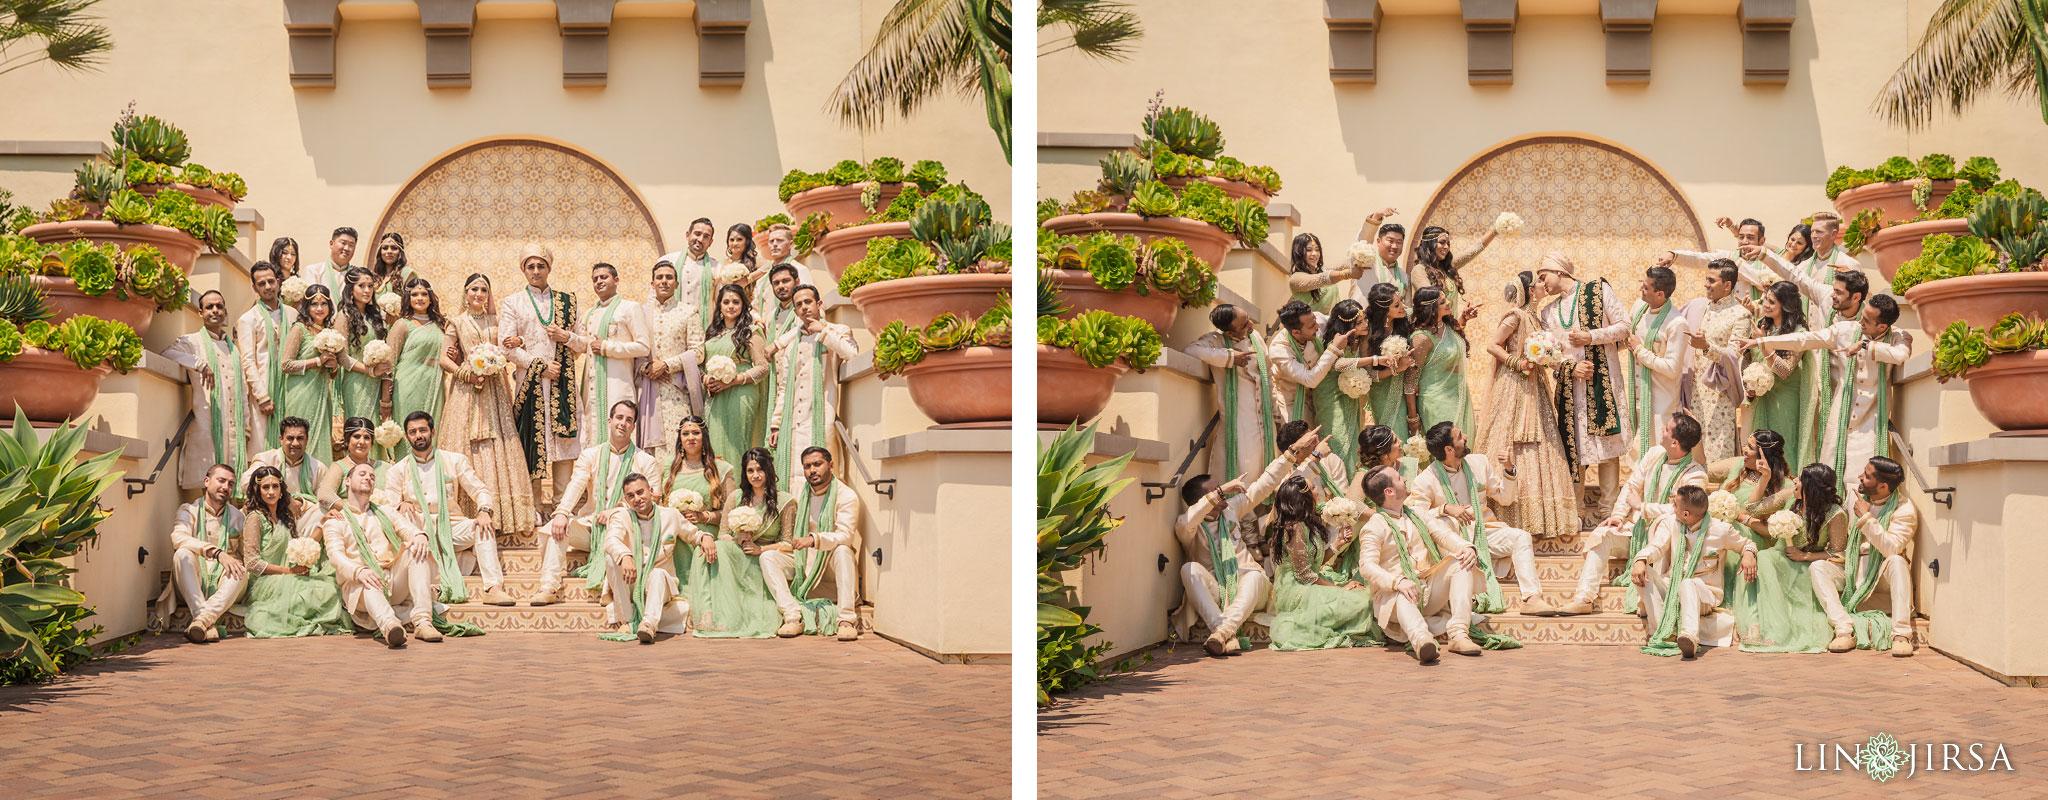 023 terranea resort palos verdes indian bridal party wedding photography